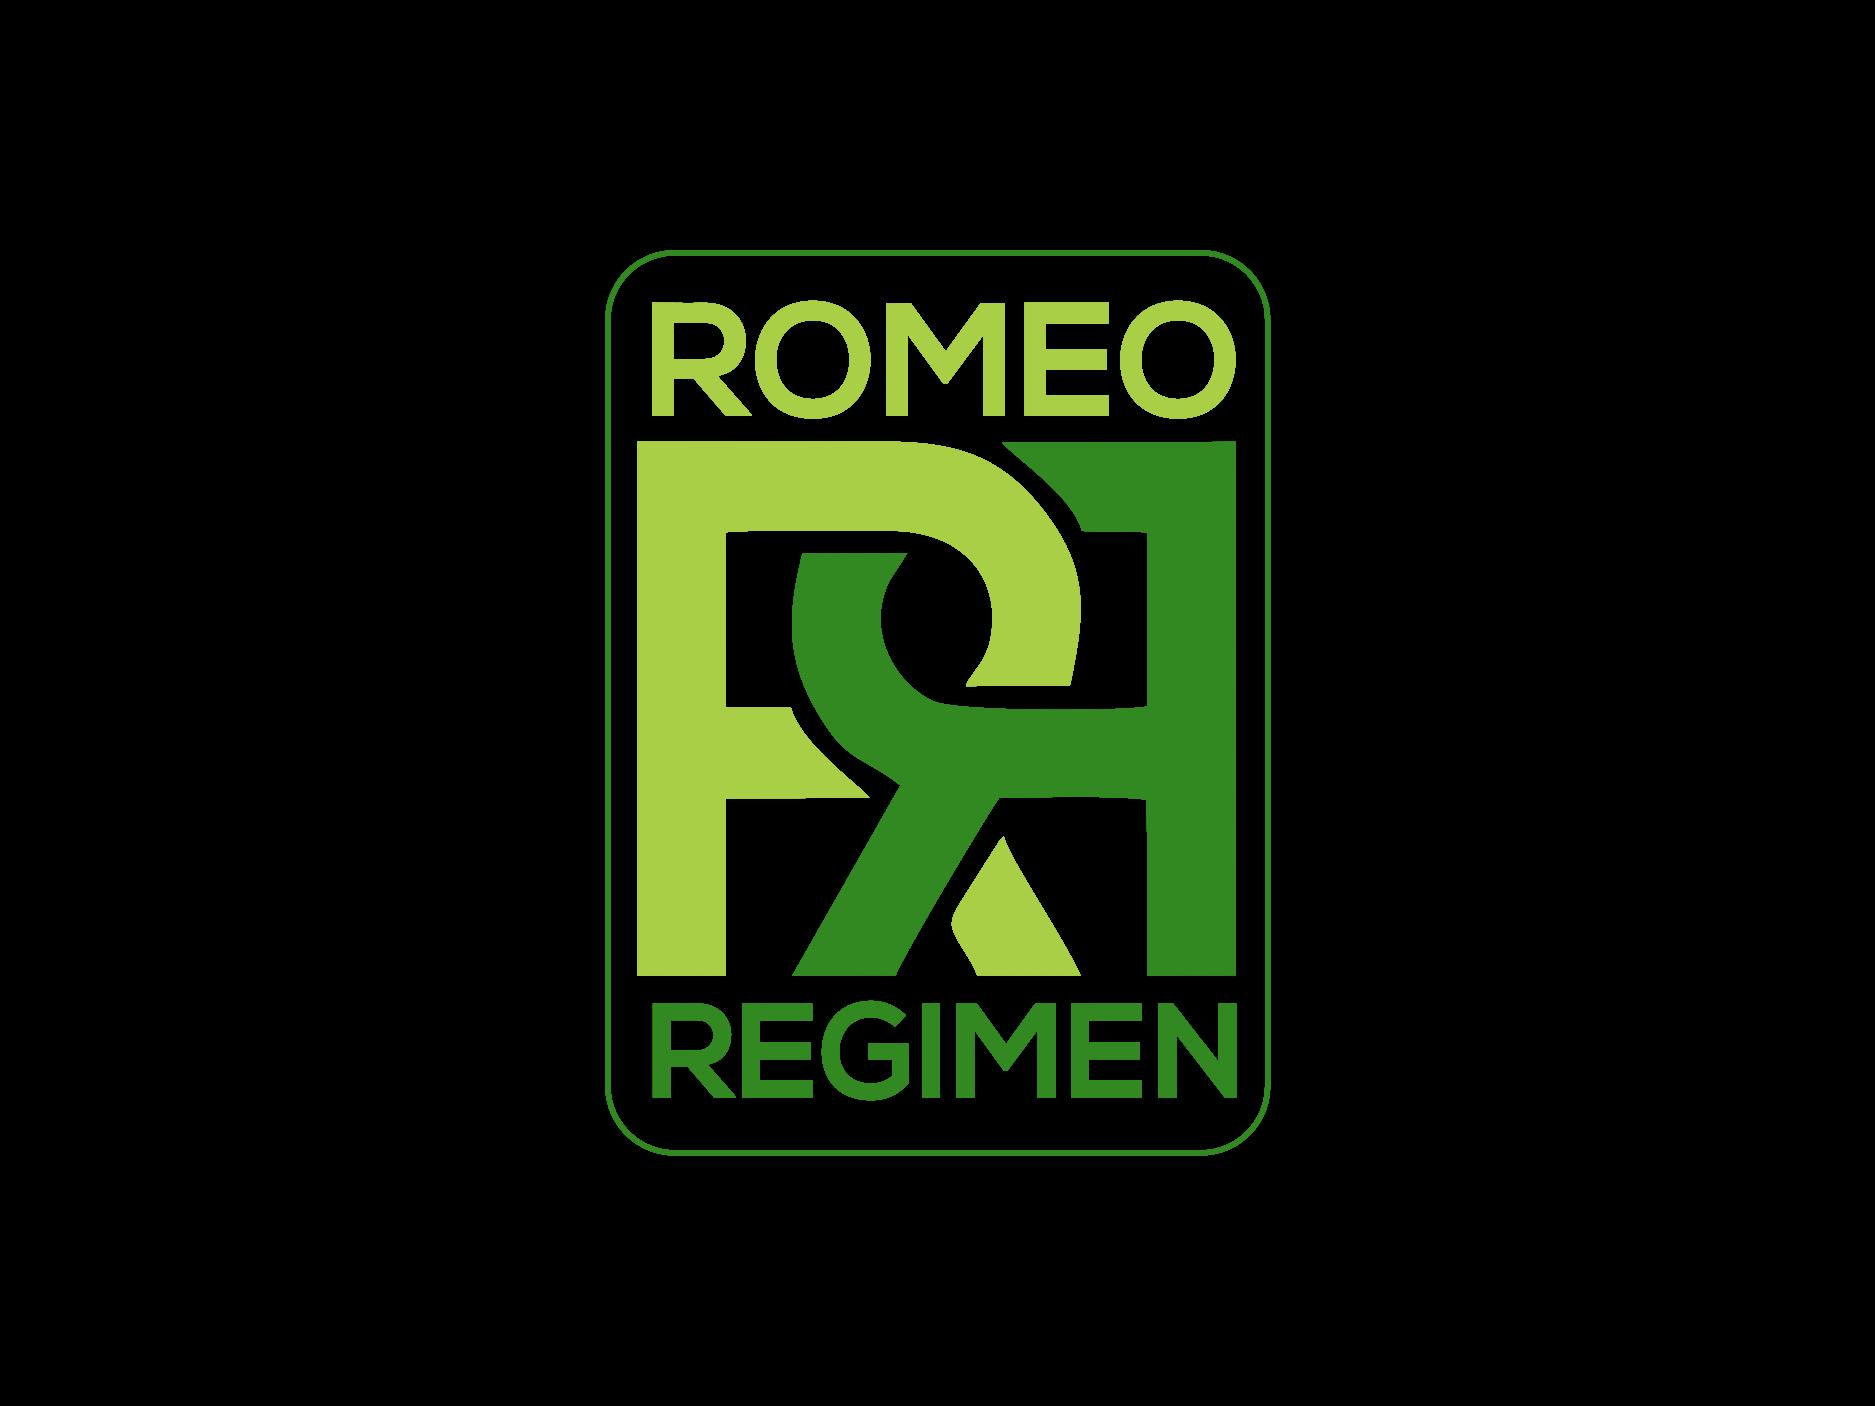 RomeoRegimen